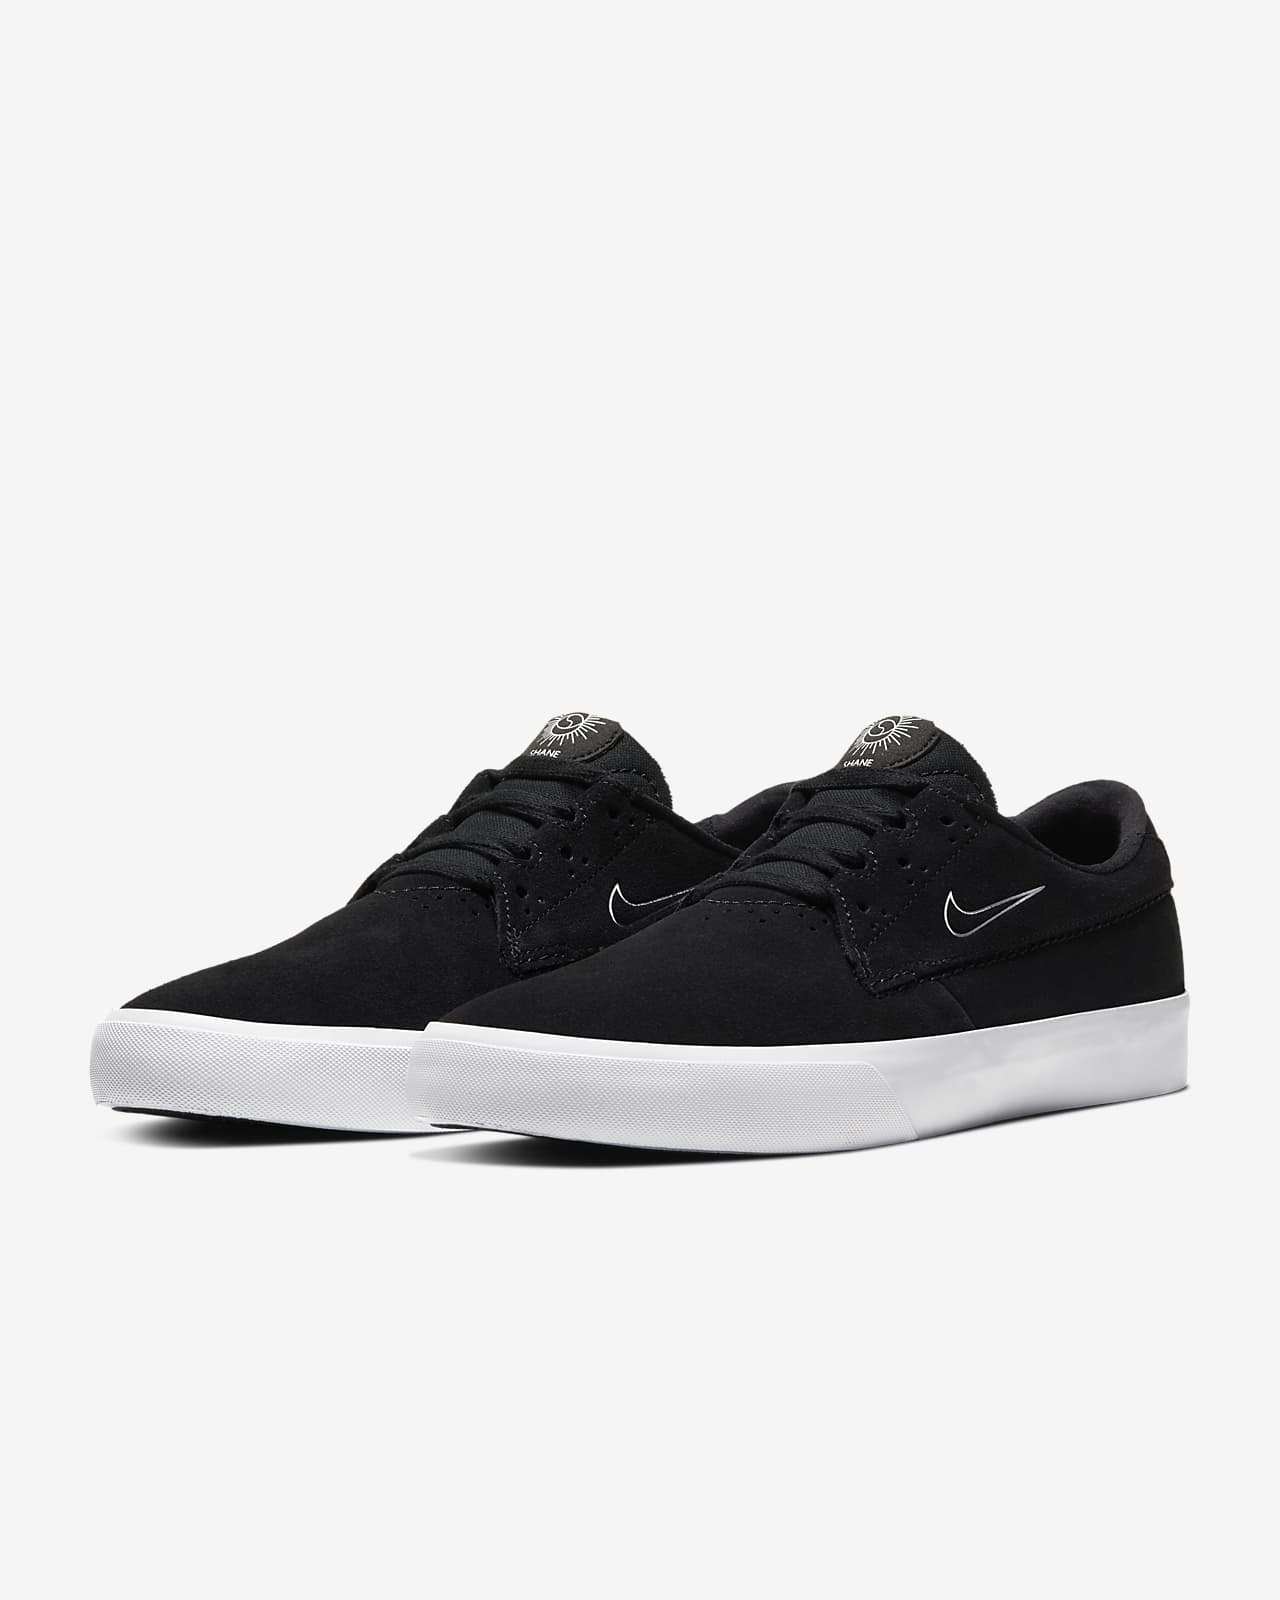 Nike SB Shane Skate Shoe. Nike LU